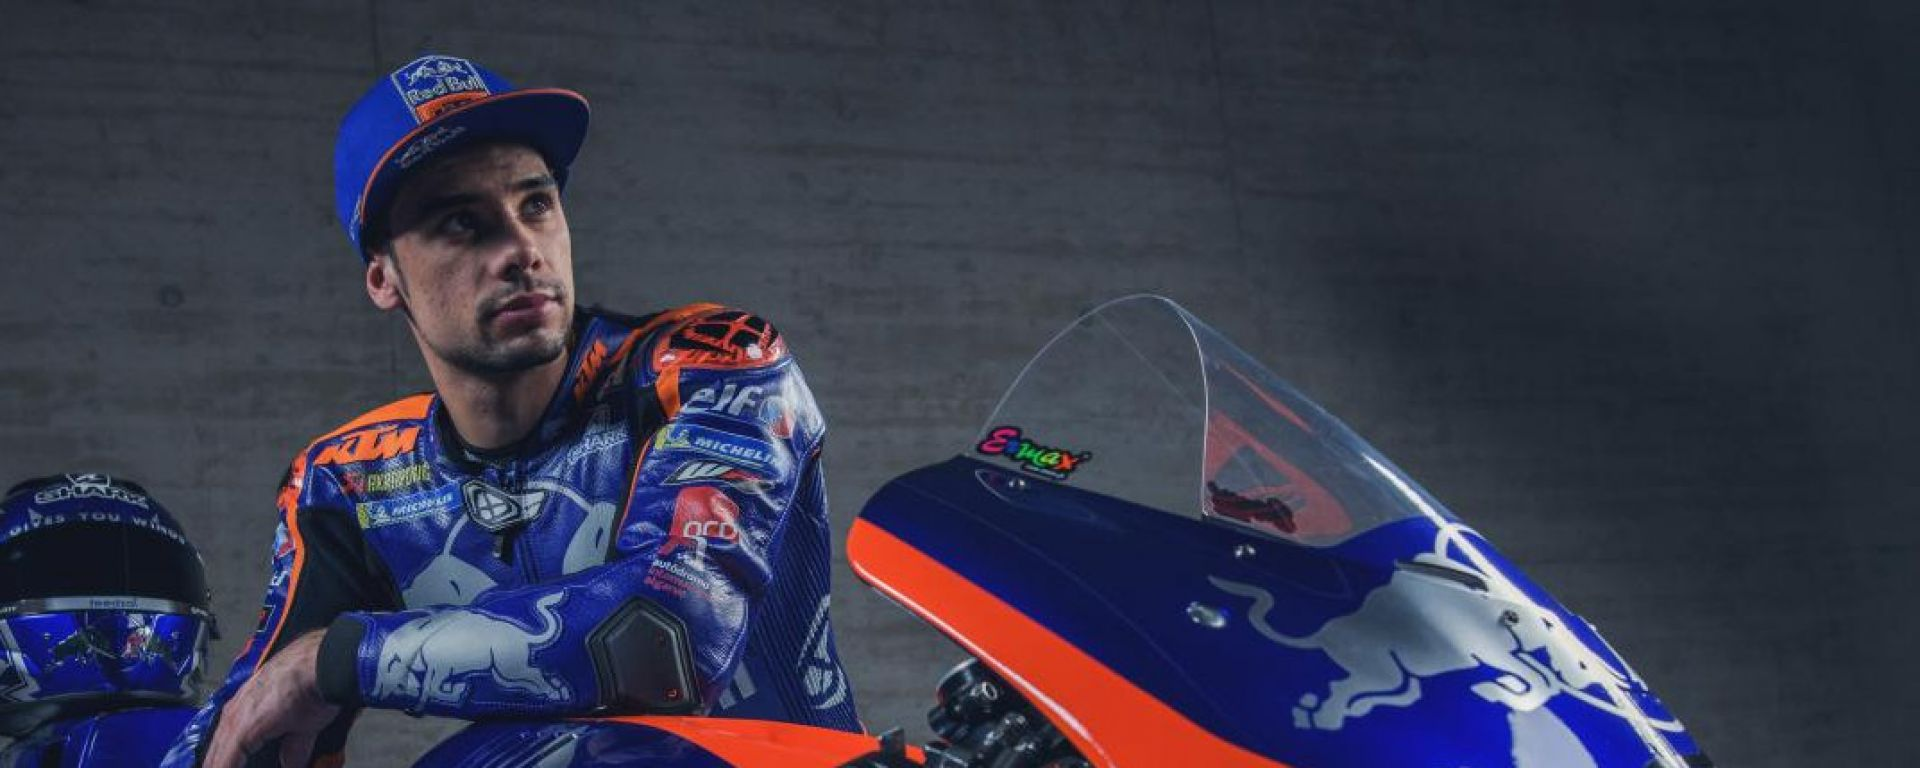 MotoGP 2019, Miguel Oliveira - Red Bull KTM Tech 3